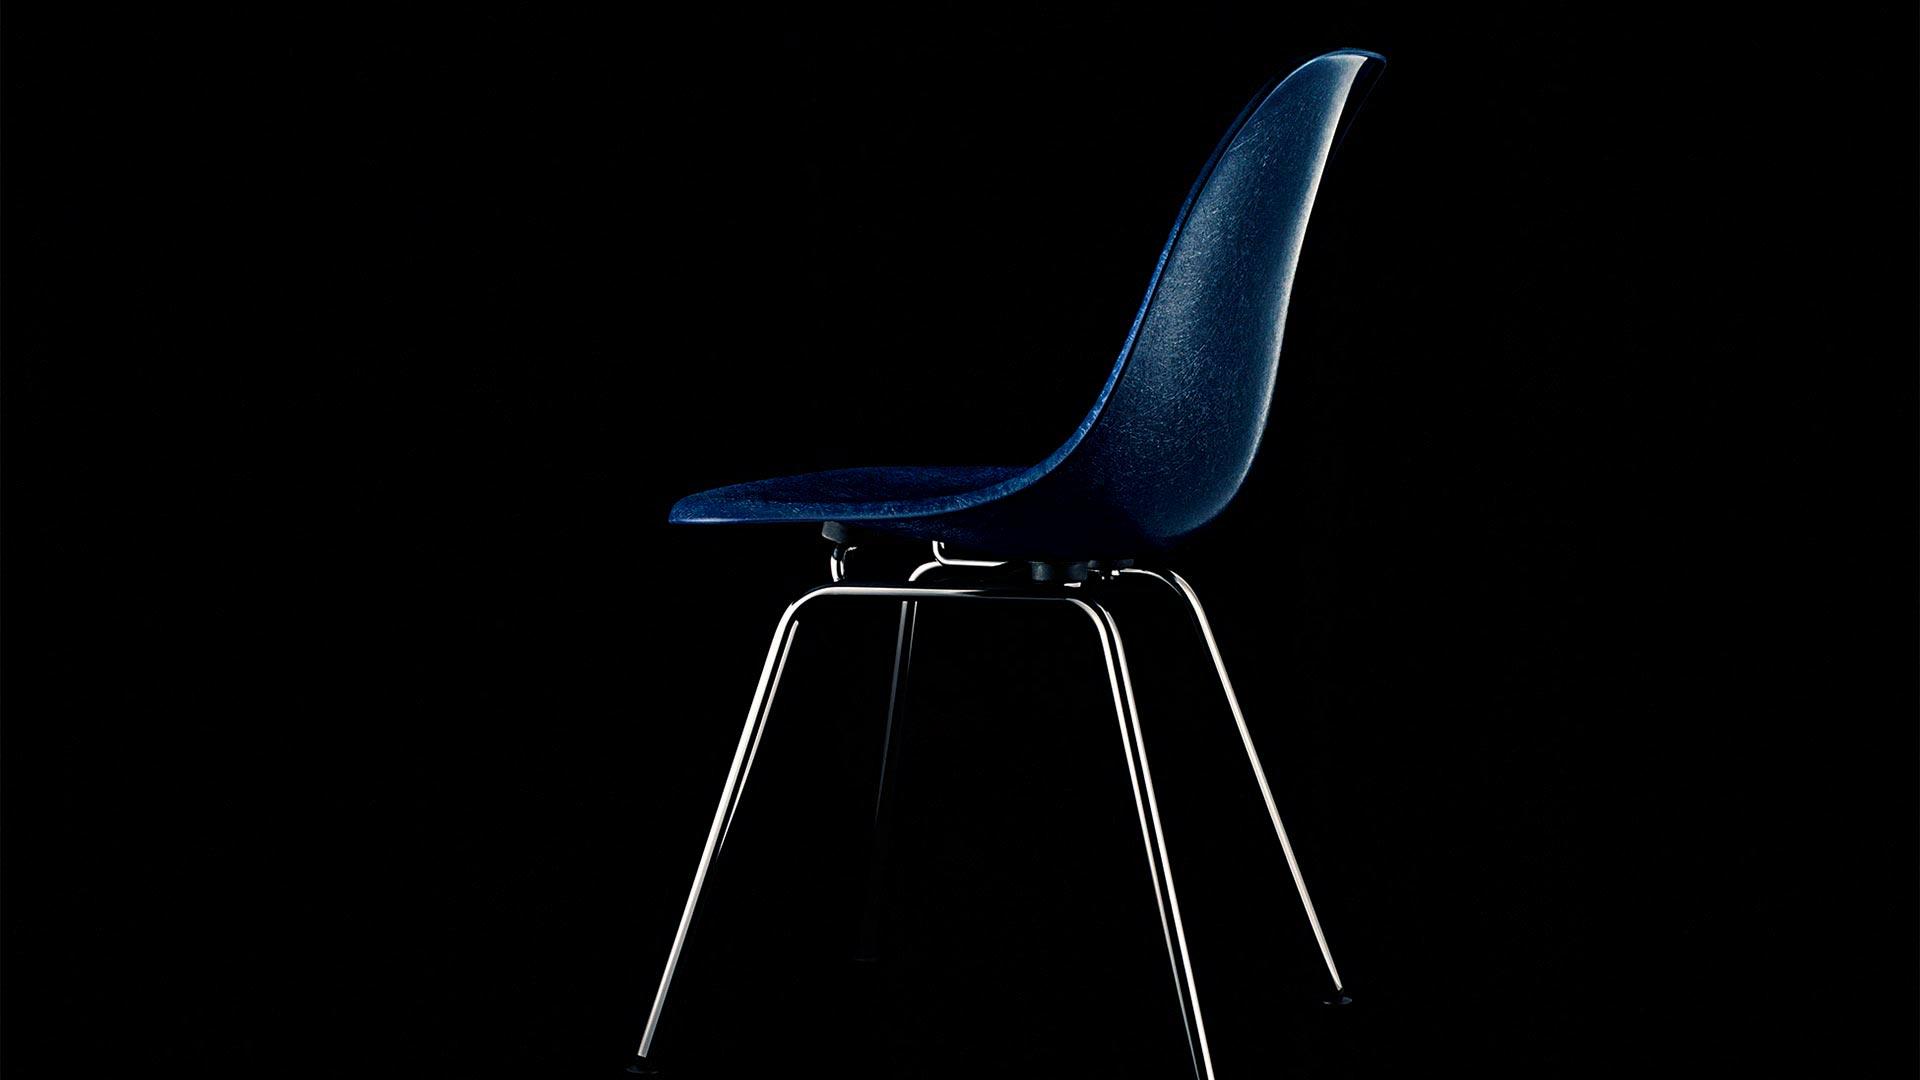 Vitra Eames Fiberglass Chair in Berlin bei steidten+ 11